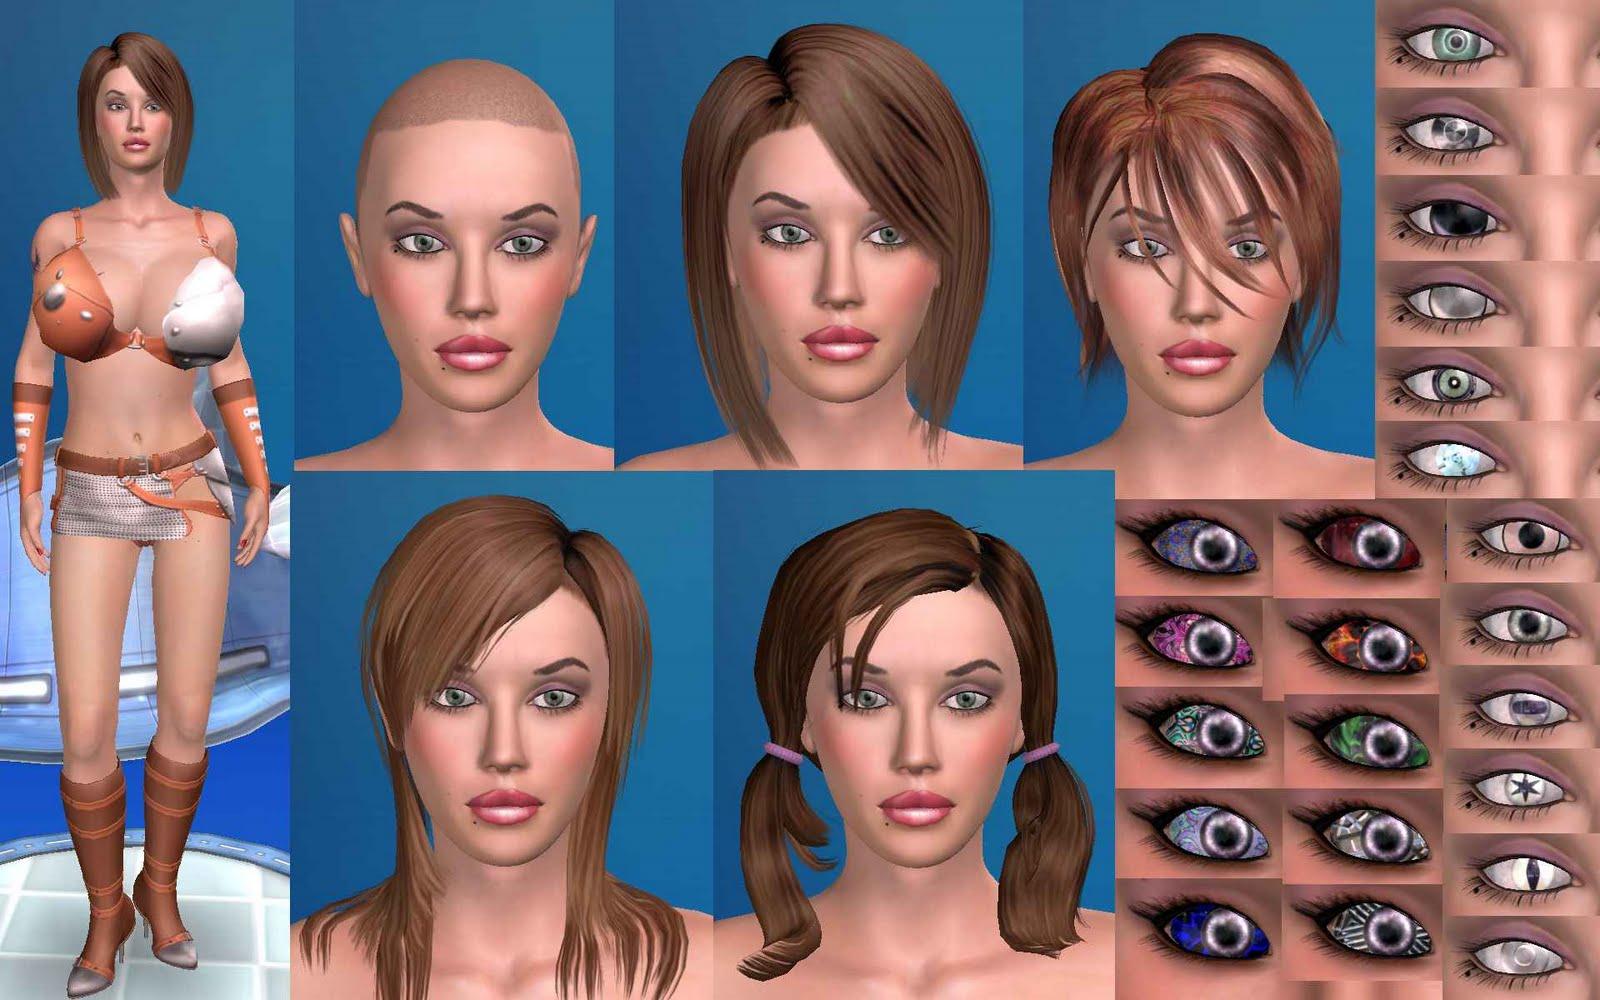 3d sexvilla 2 mods porn image